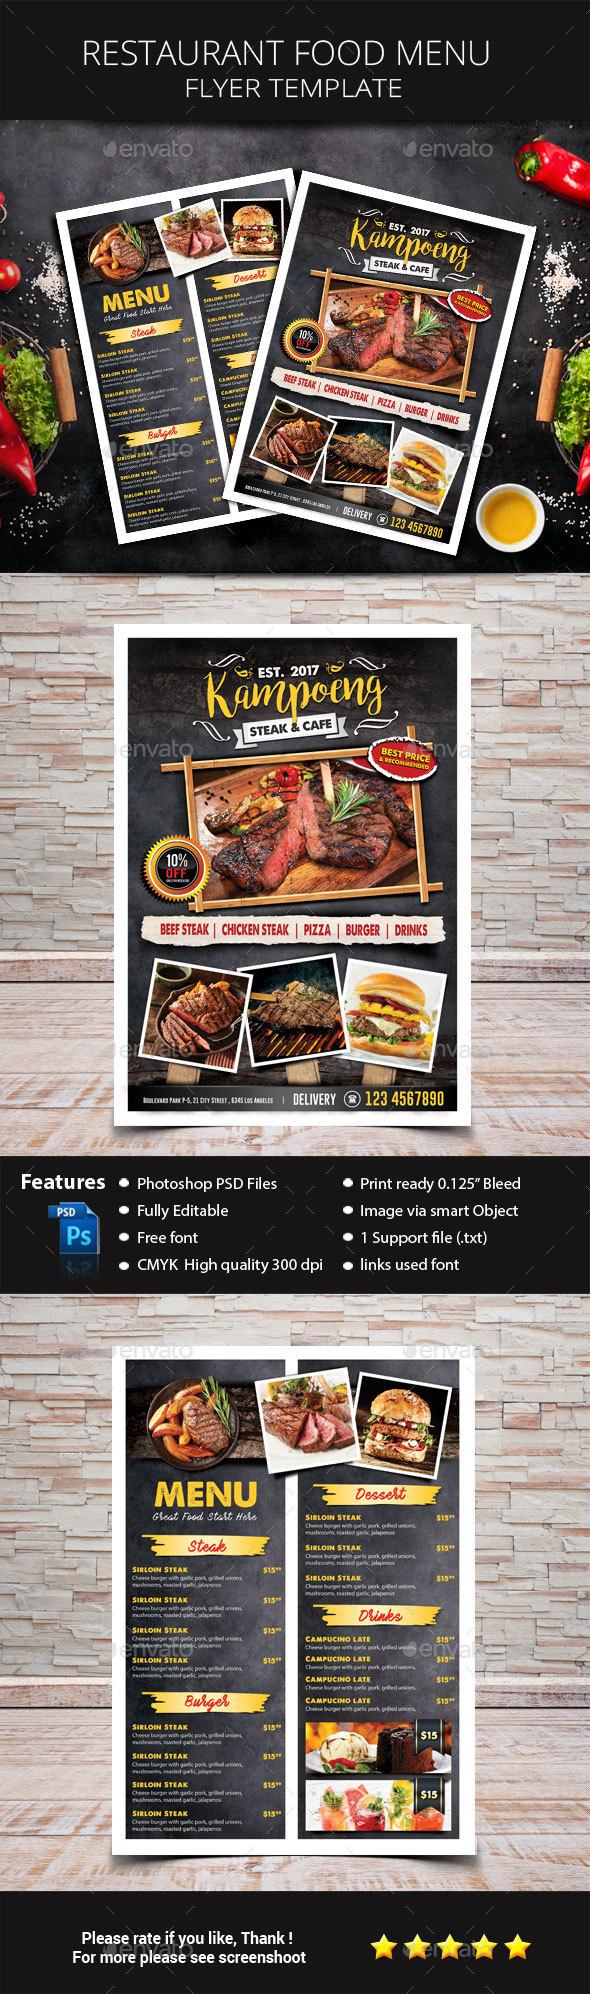 Restaurant Food Menu - Restaurant Flyers